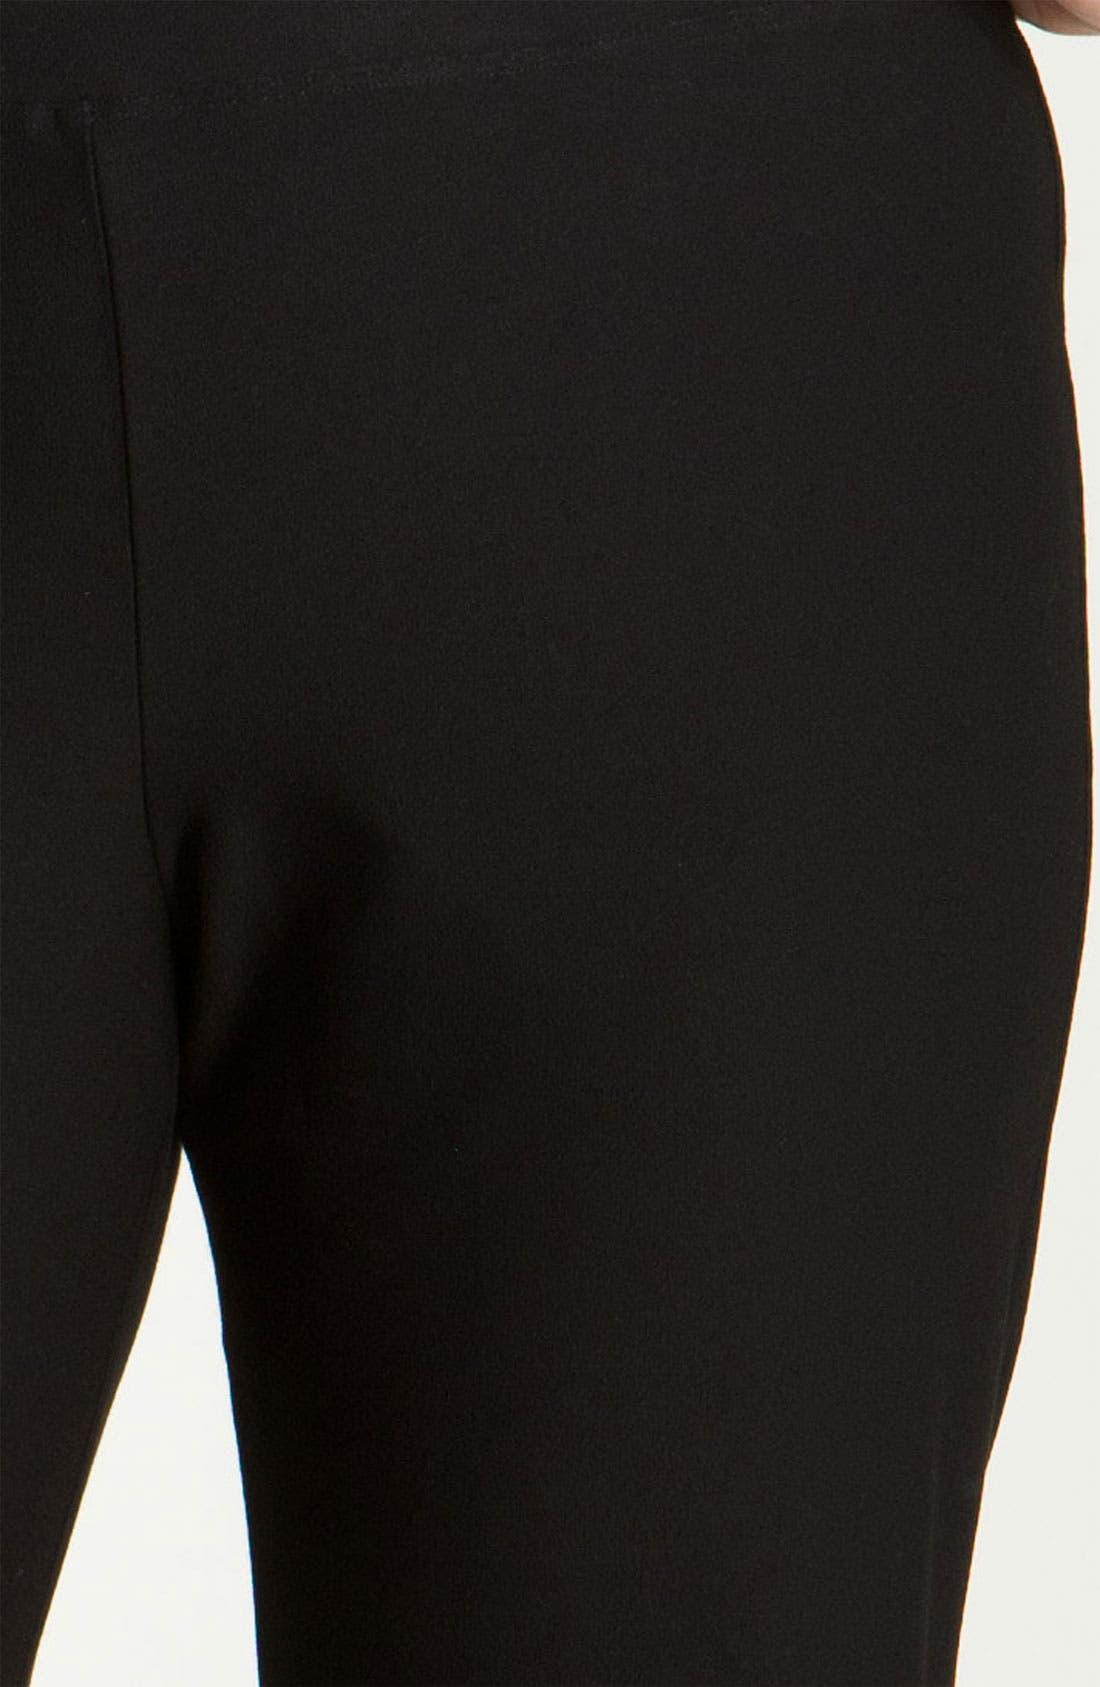 EILEEN FISHER, Crepe Ankle Pants, Alternate thumbnail 2, color, BLACK